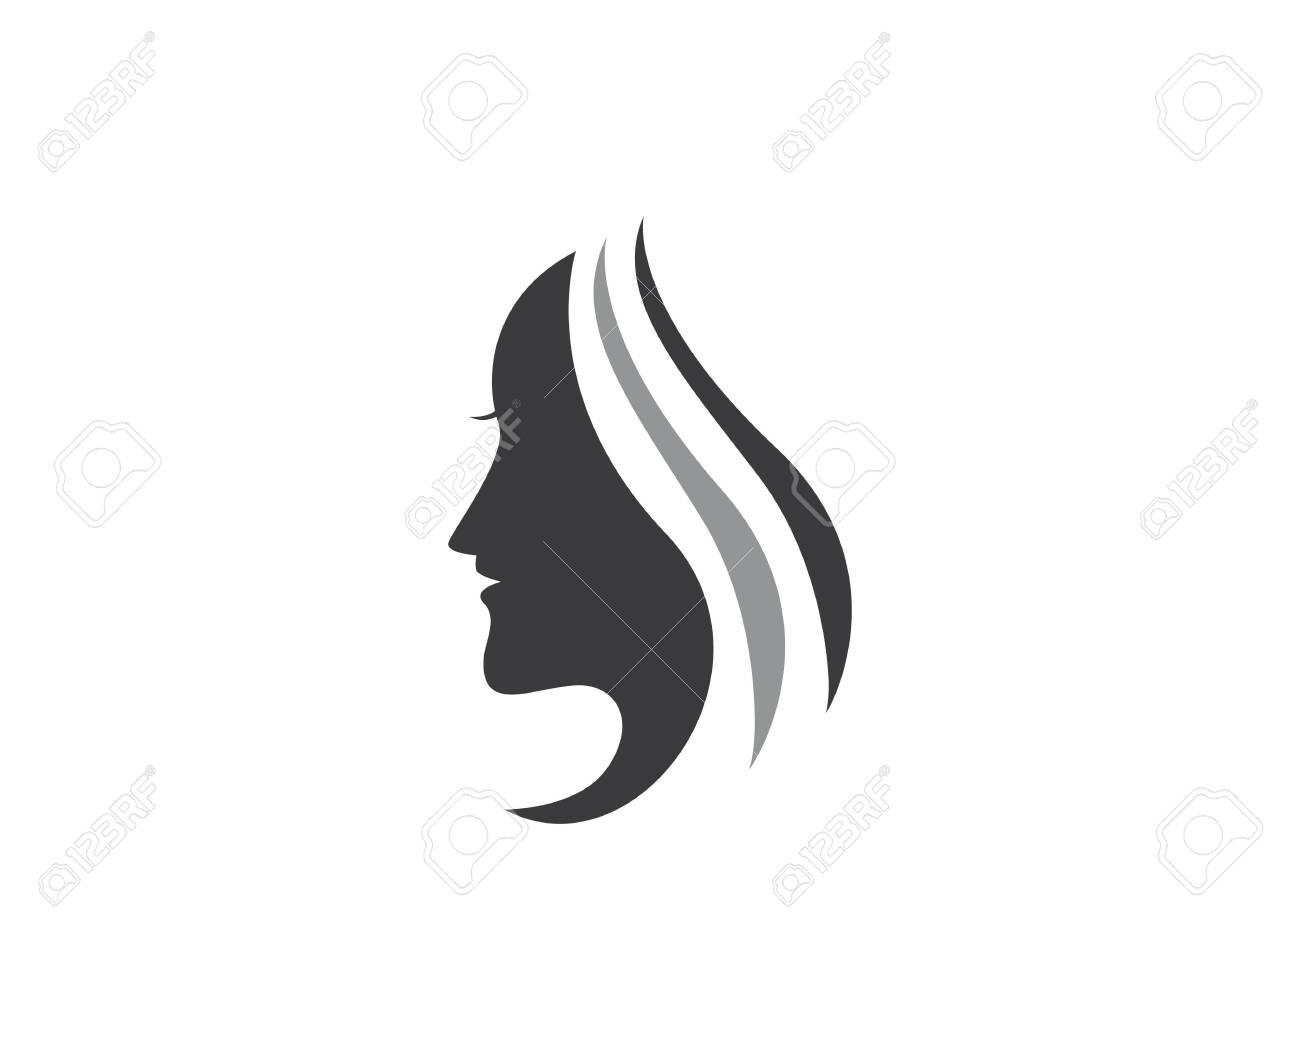 beauty woman logo icon - 129089624